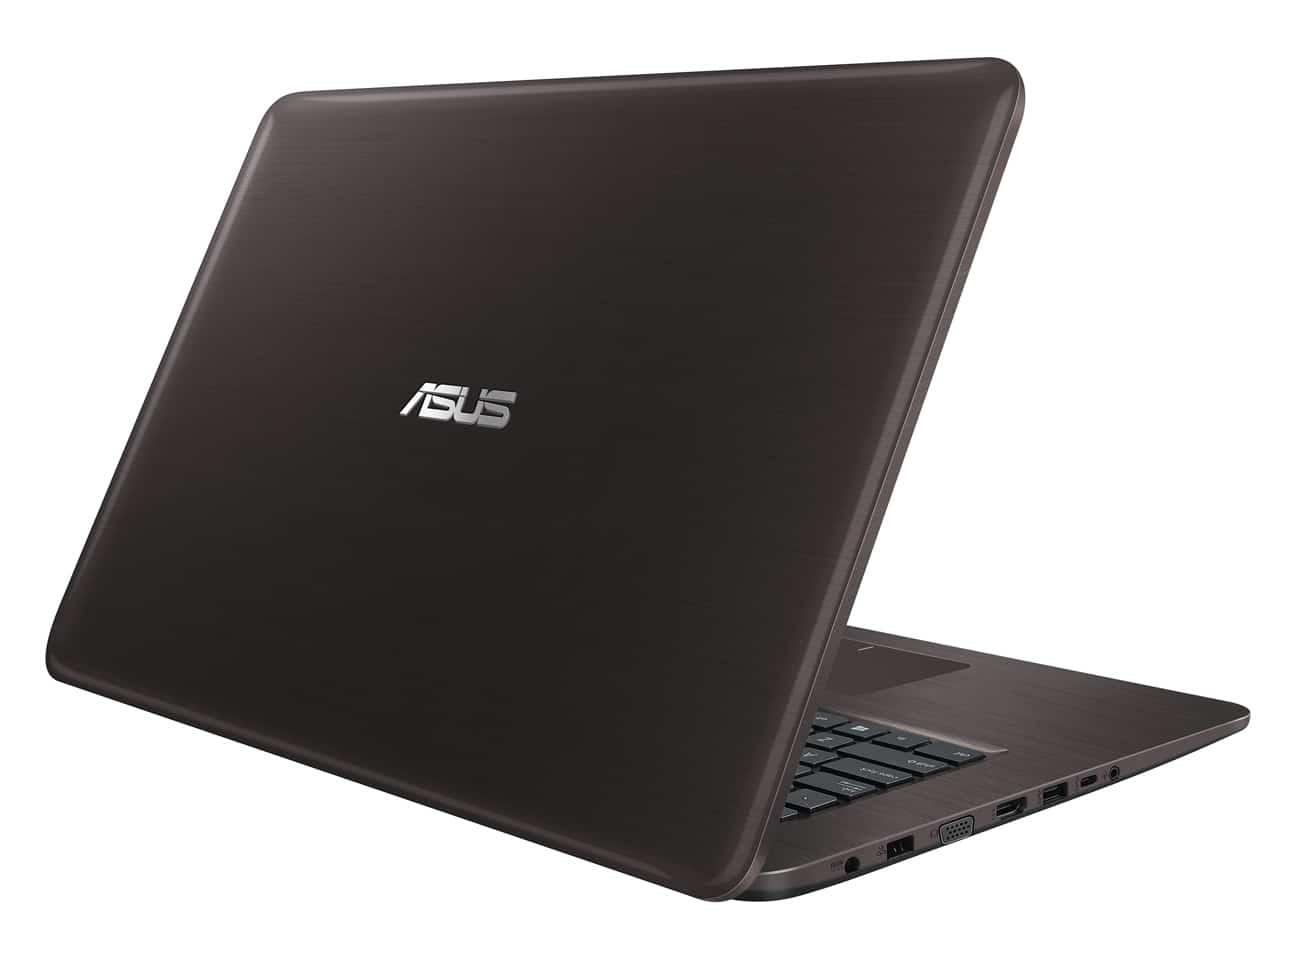 Asus K756UQ-TY277T, PC portable 17 pouces i5 Kaby Lake 940MX promo 630€